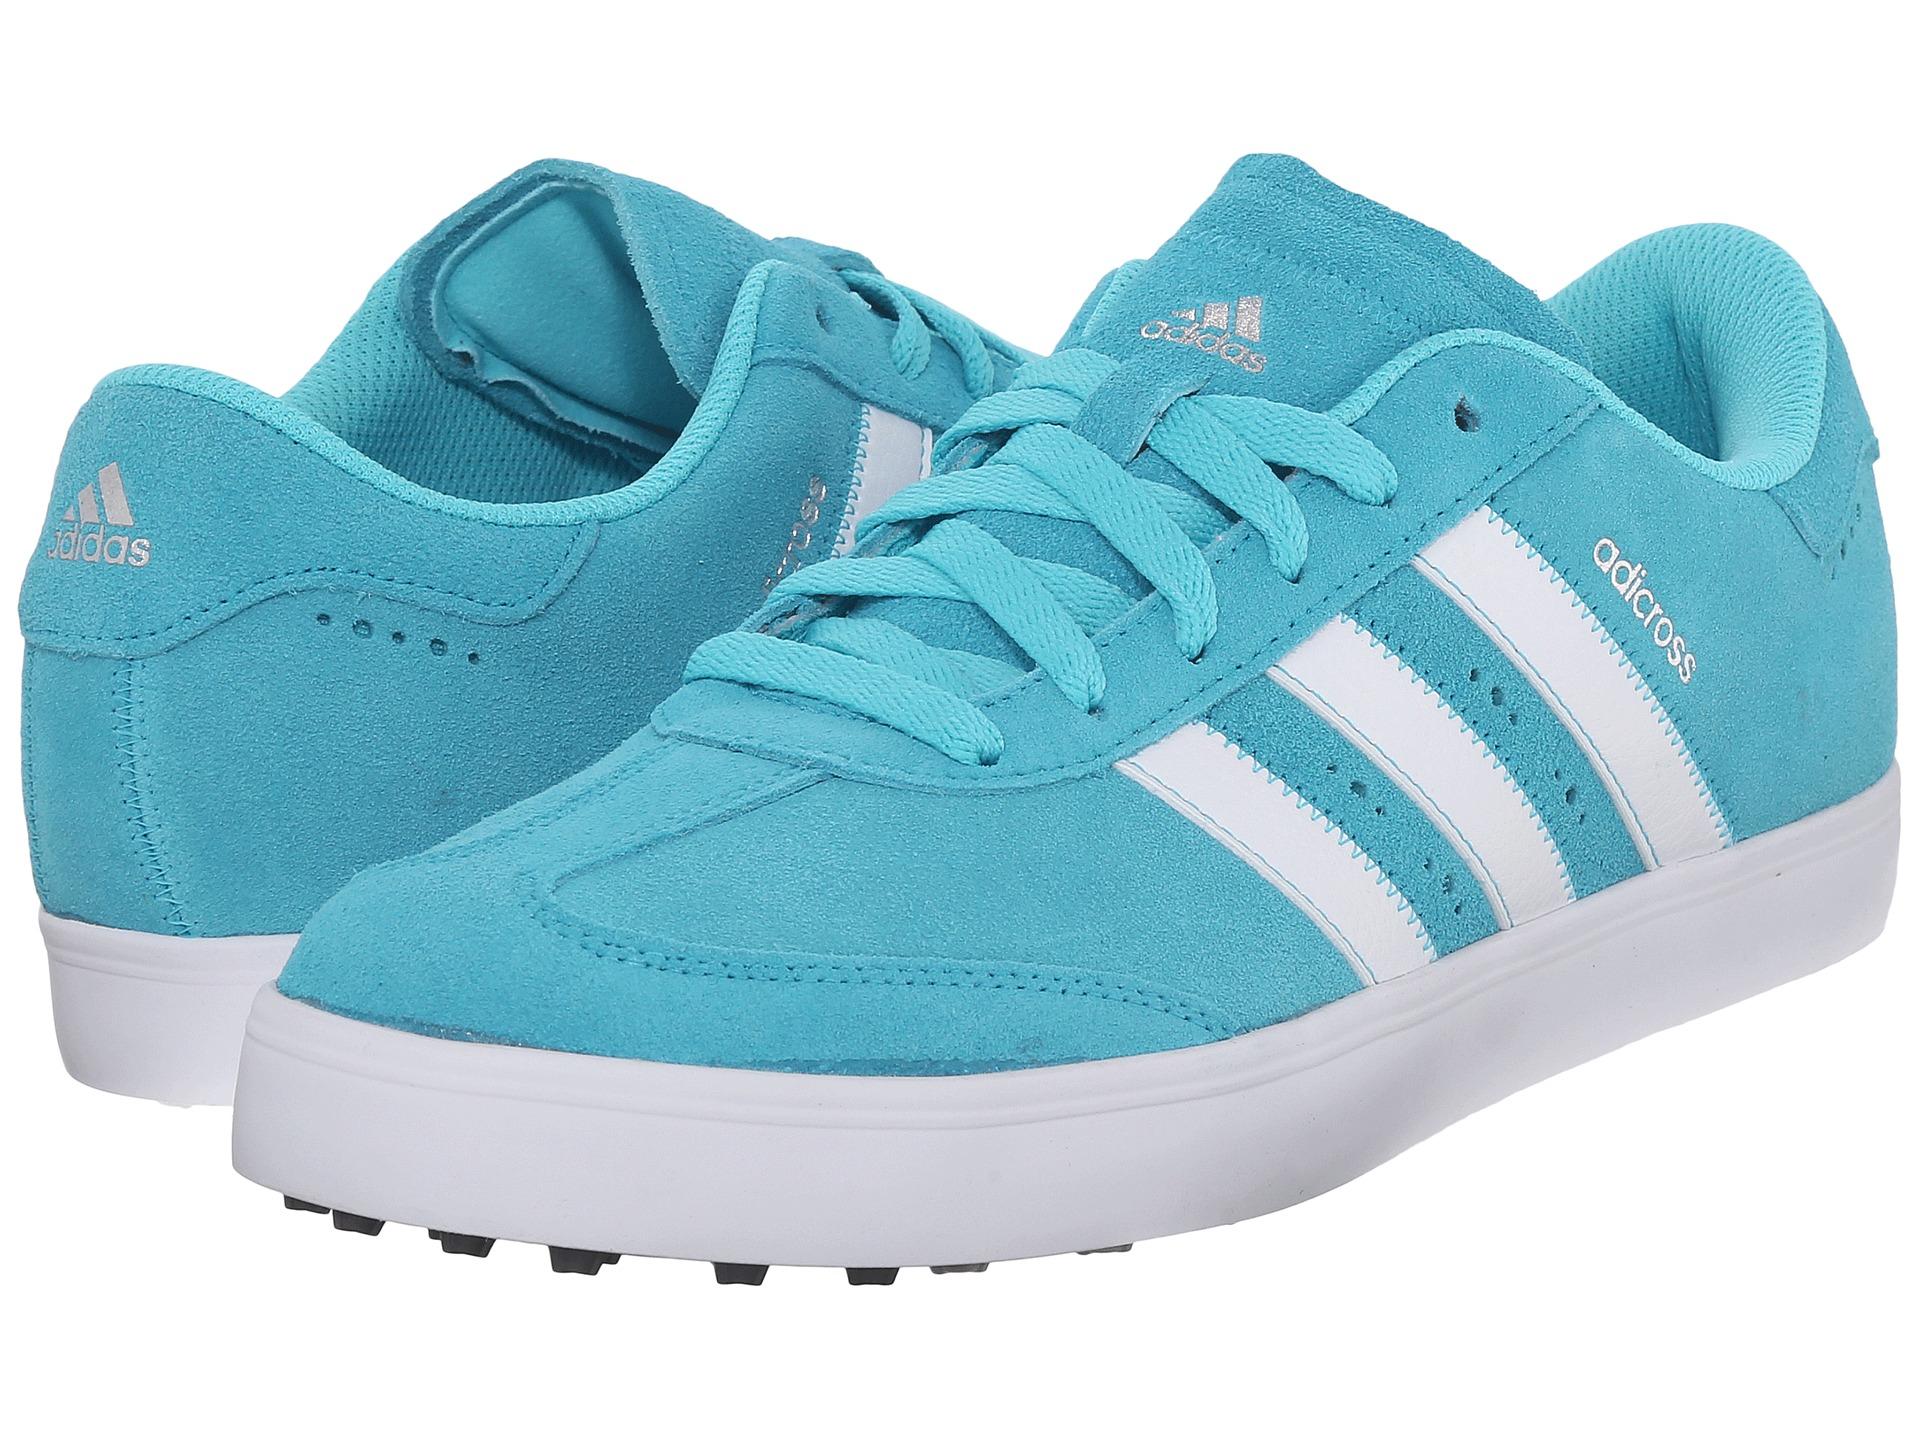 adidas hommes originaux superstar fondation chaussures hommes adidas et femmes royaume - uni a84421